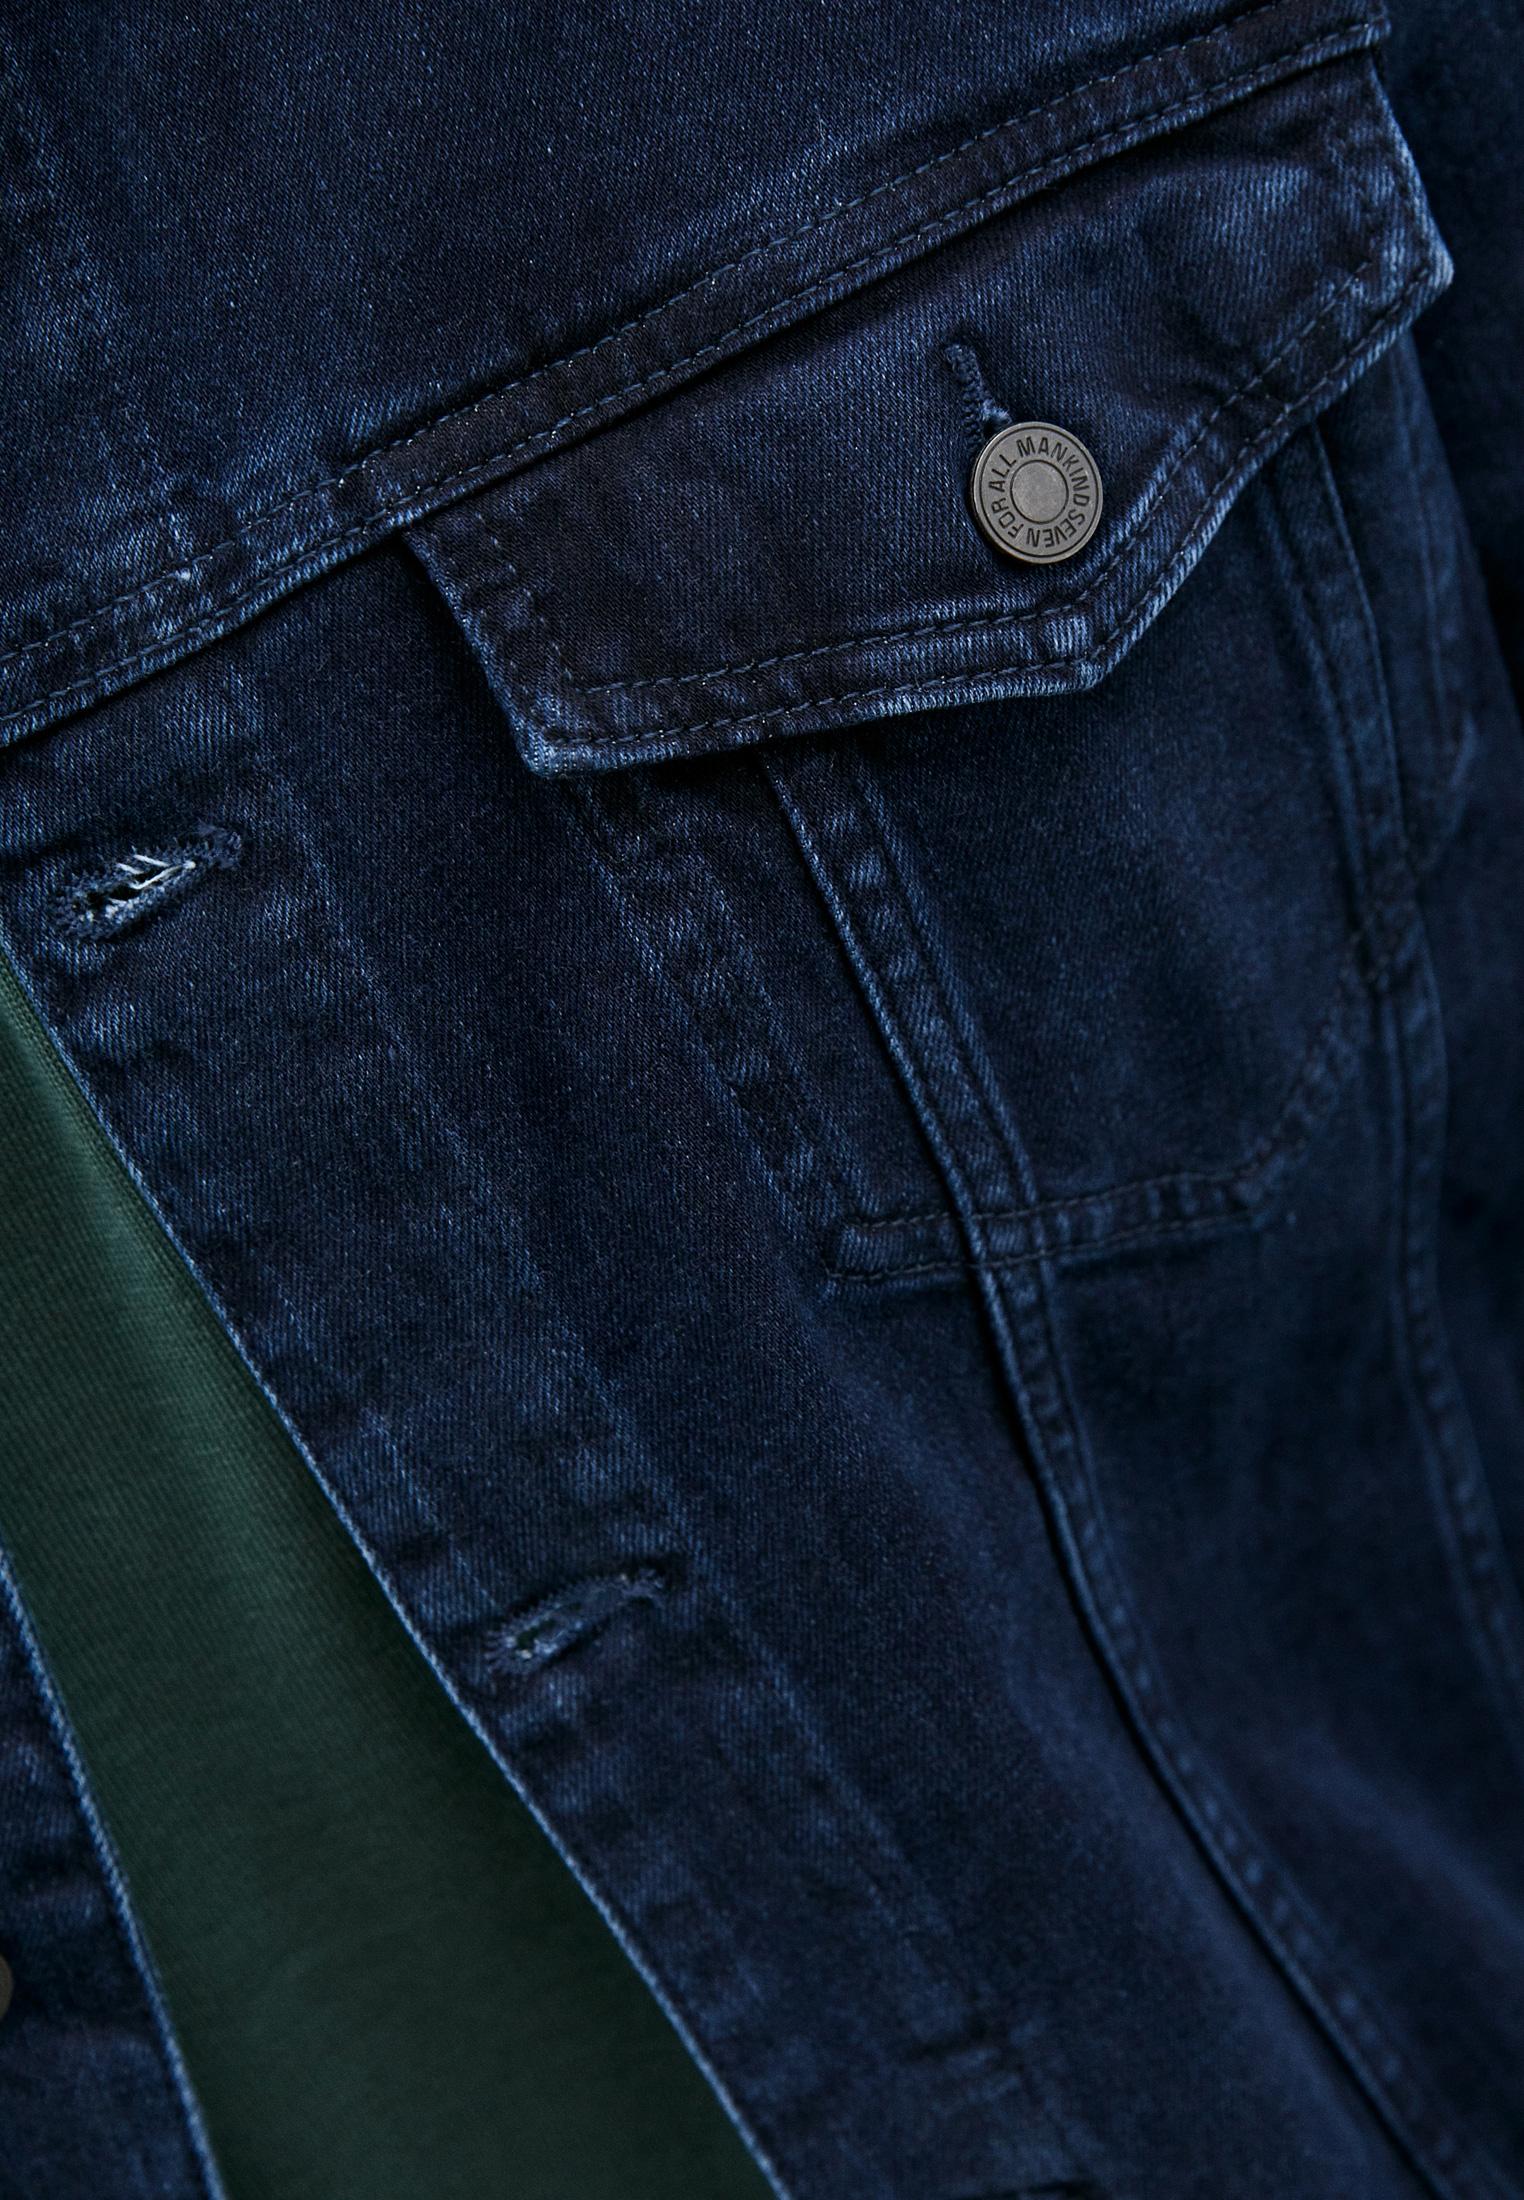 Джинсовая куртка 7 For All Mankind (7 Фо Олл Мэнкайнд) JSK5R460LL: изображение 5